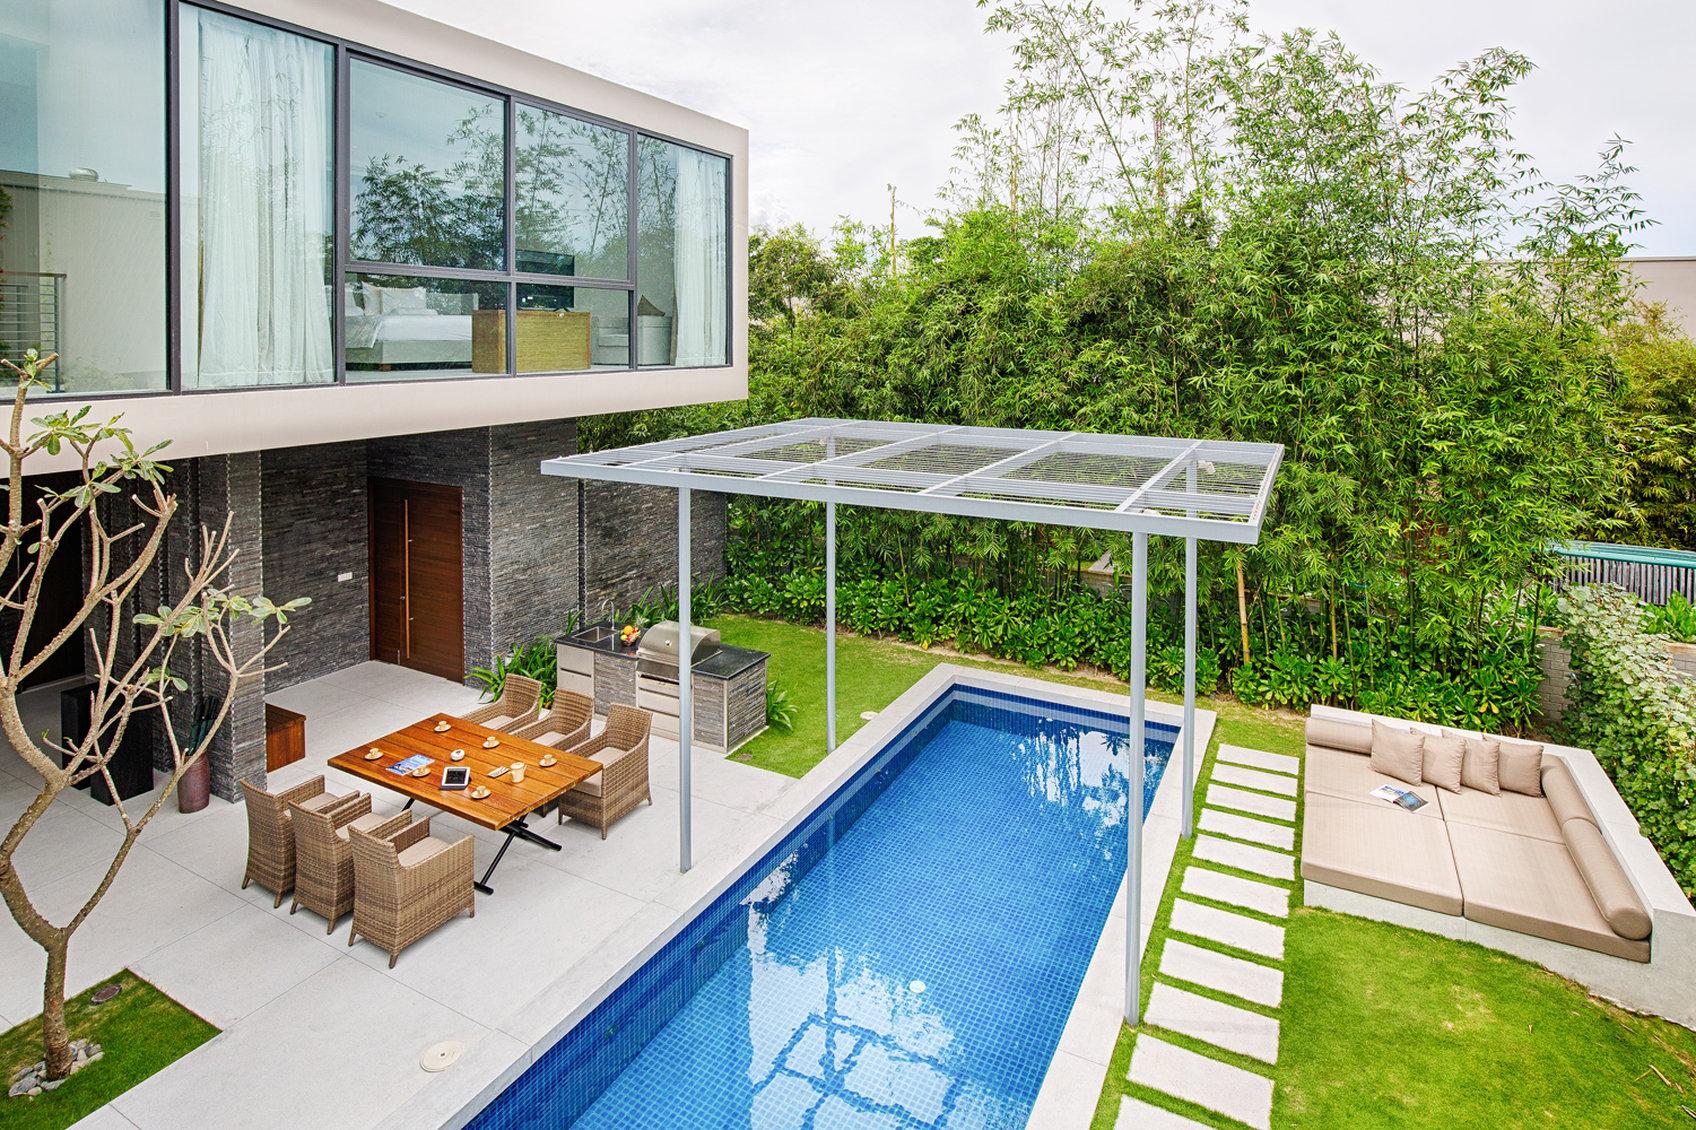 1_Garden_Pool_Villa_Pool_S.jpg